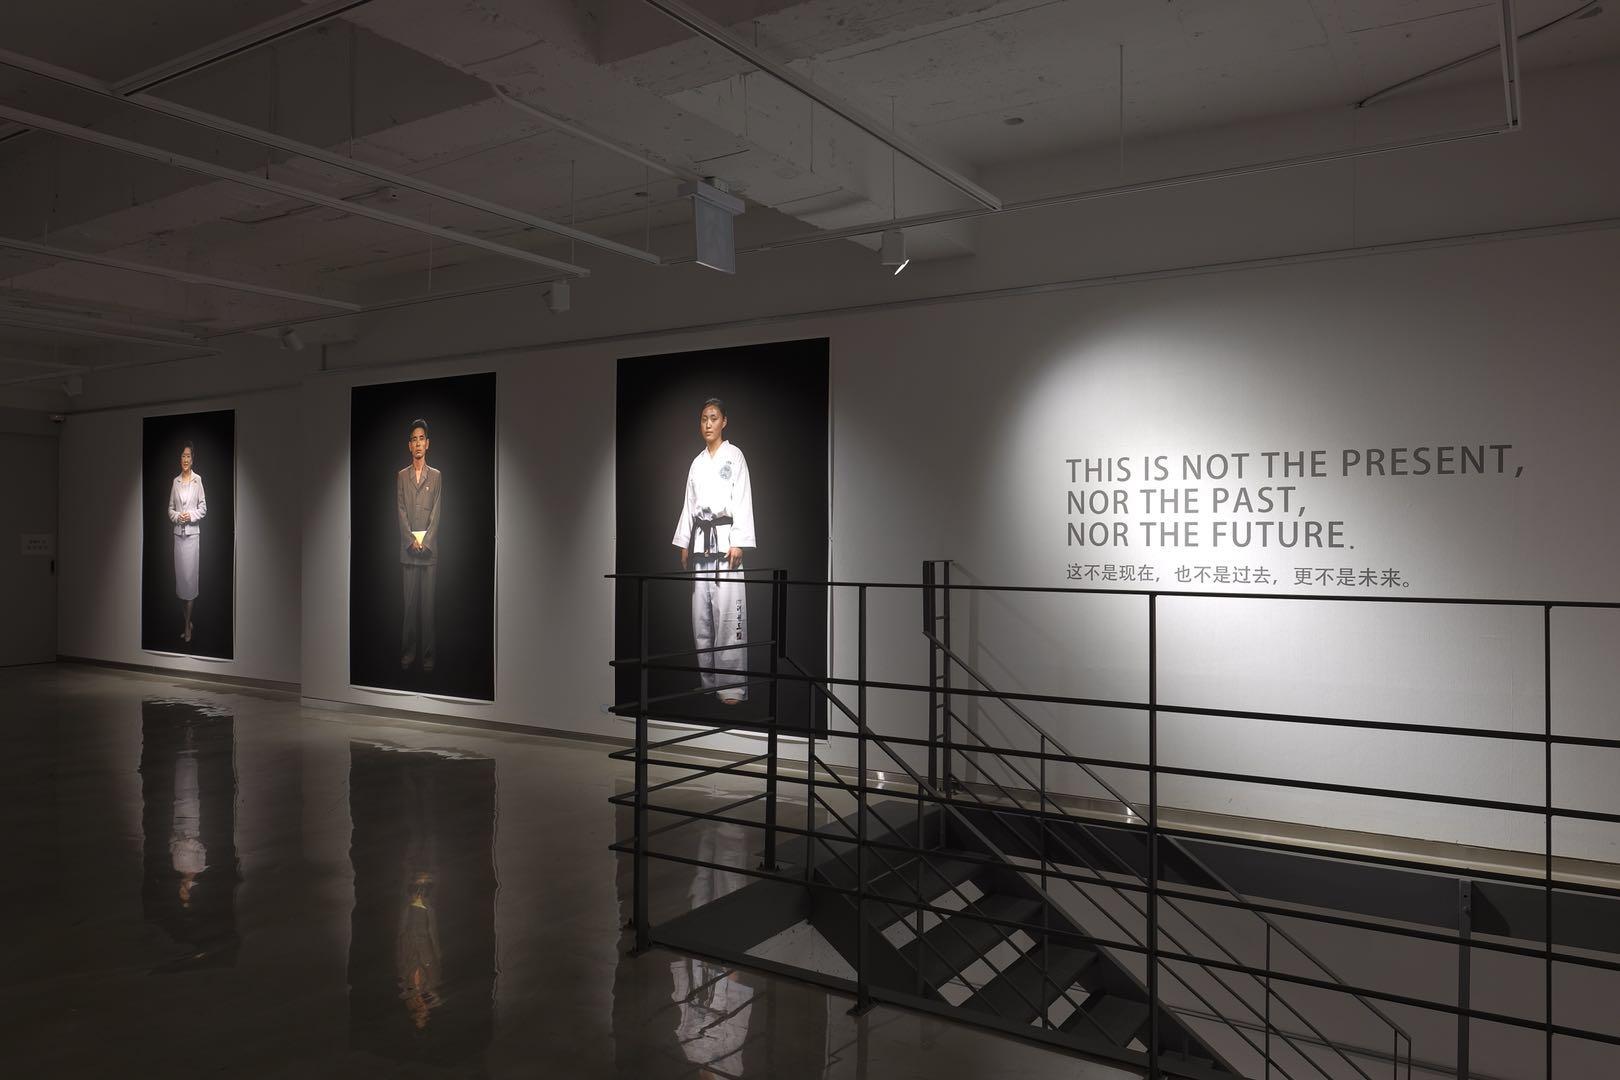 Wang Guofeng participates in Gwangju Biennale 2018